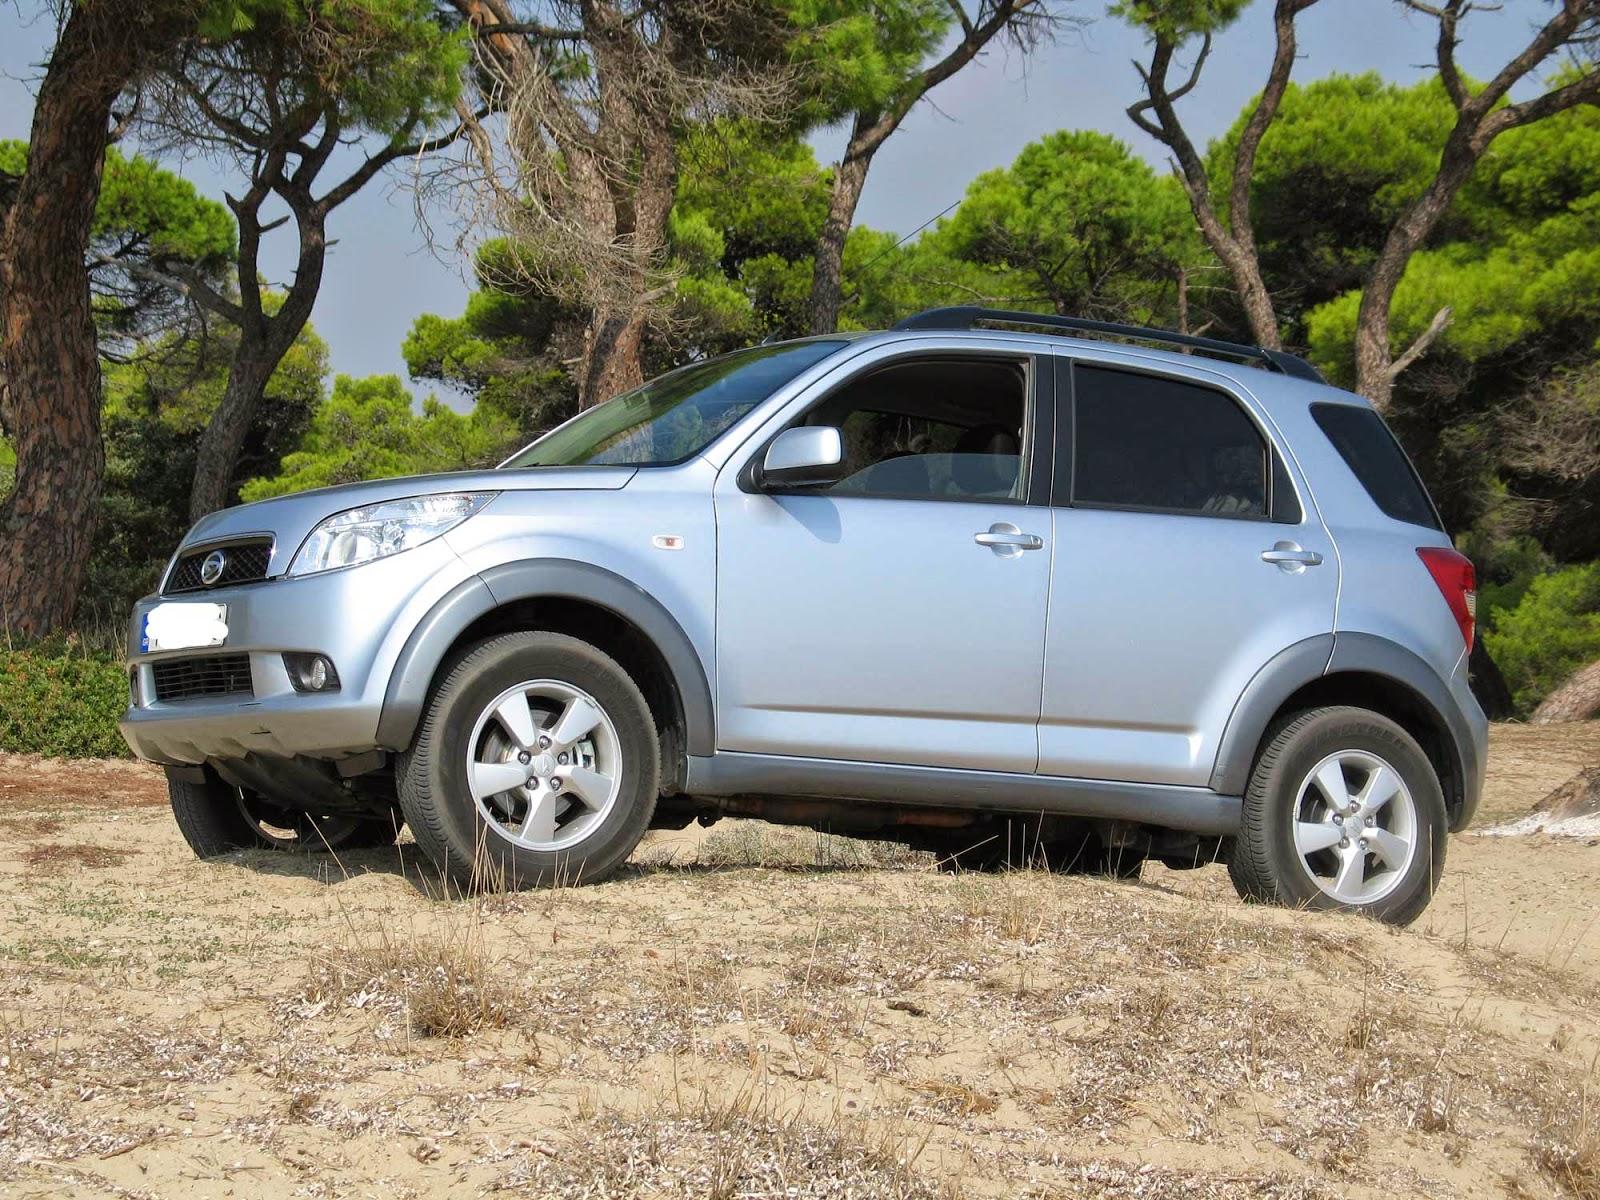 Daihatsu Terios 1.5 pic1